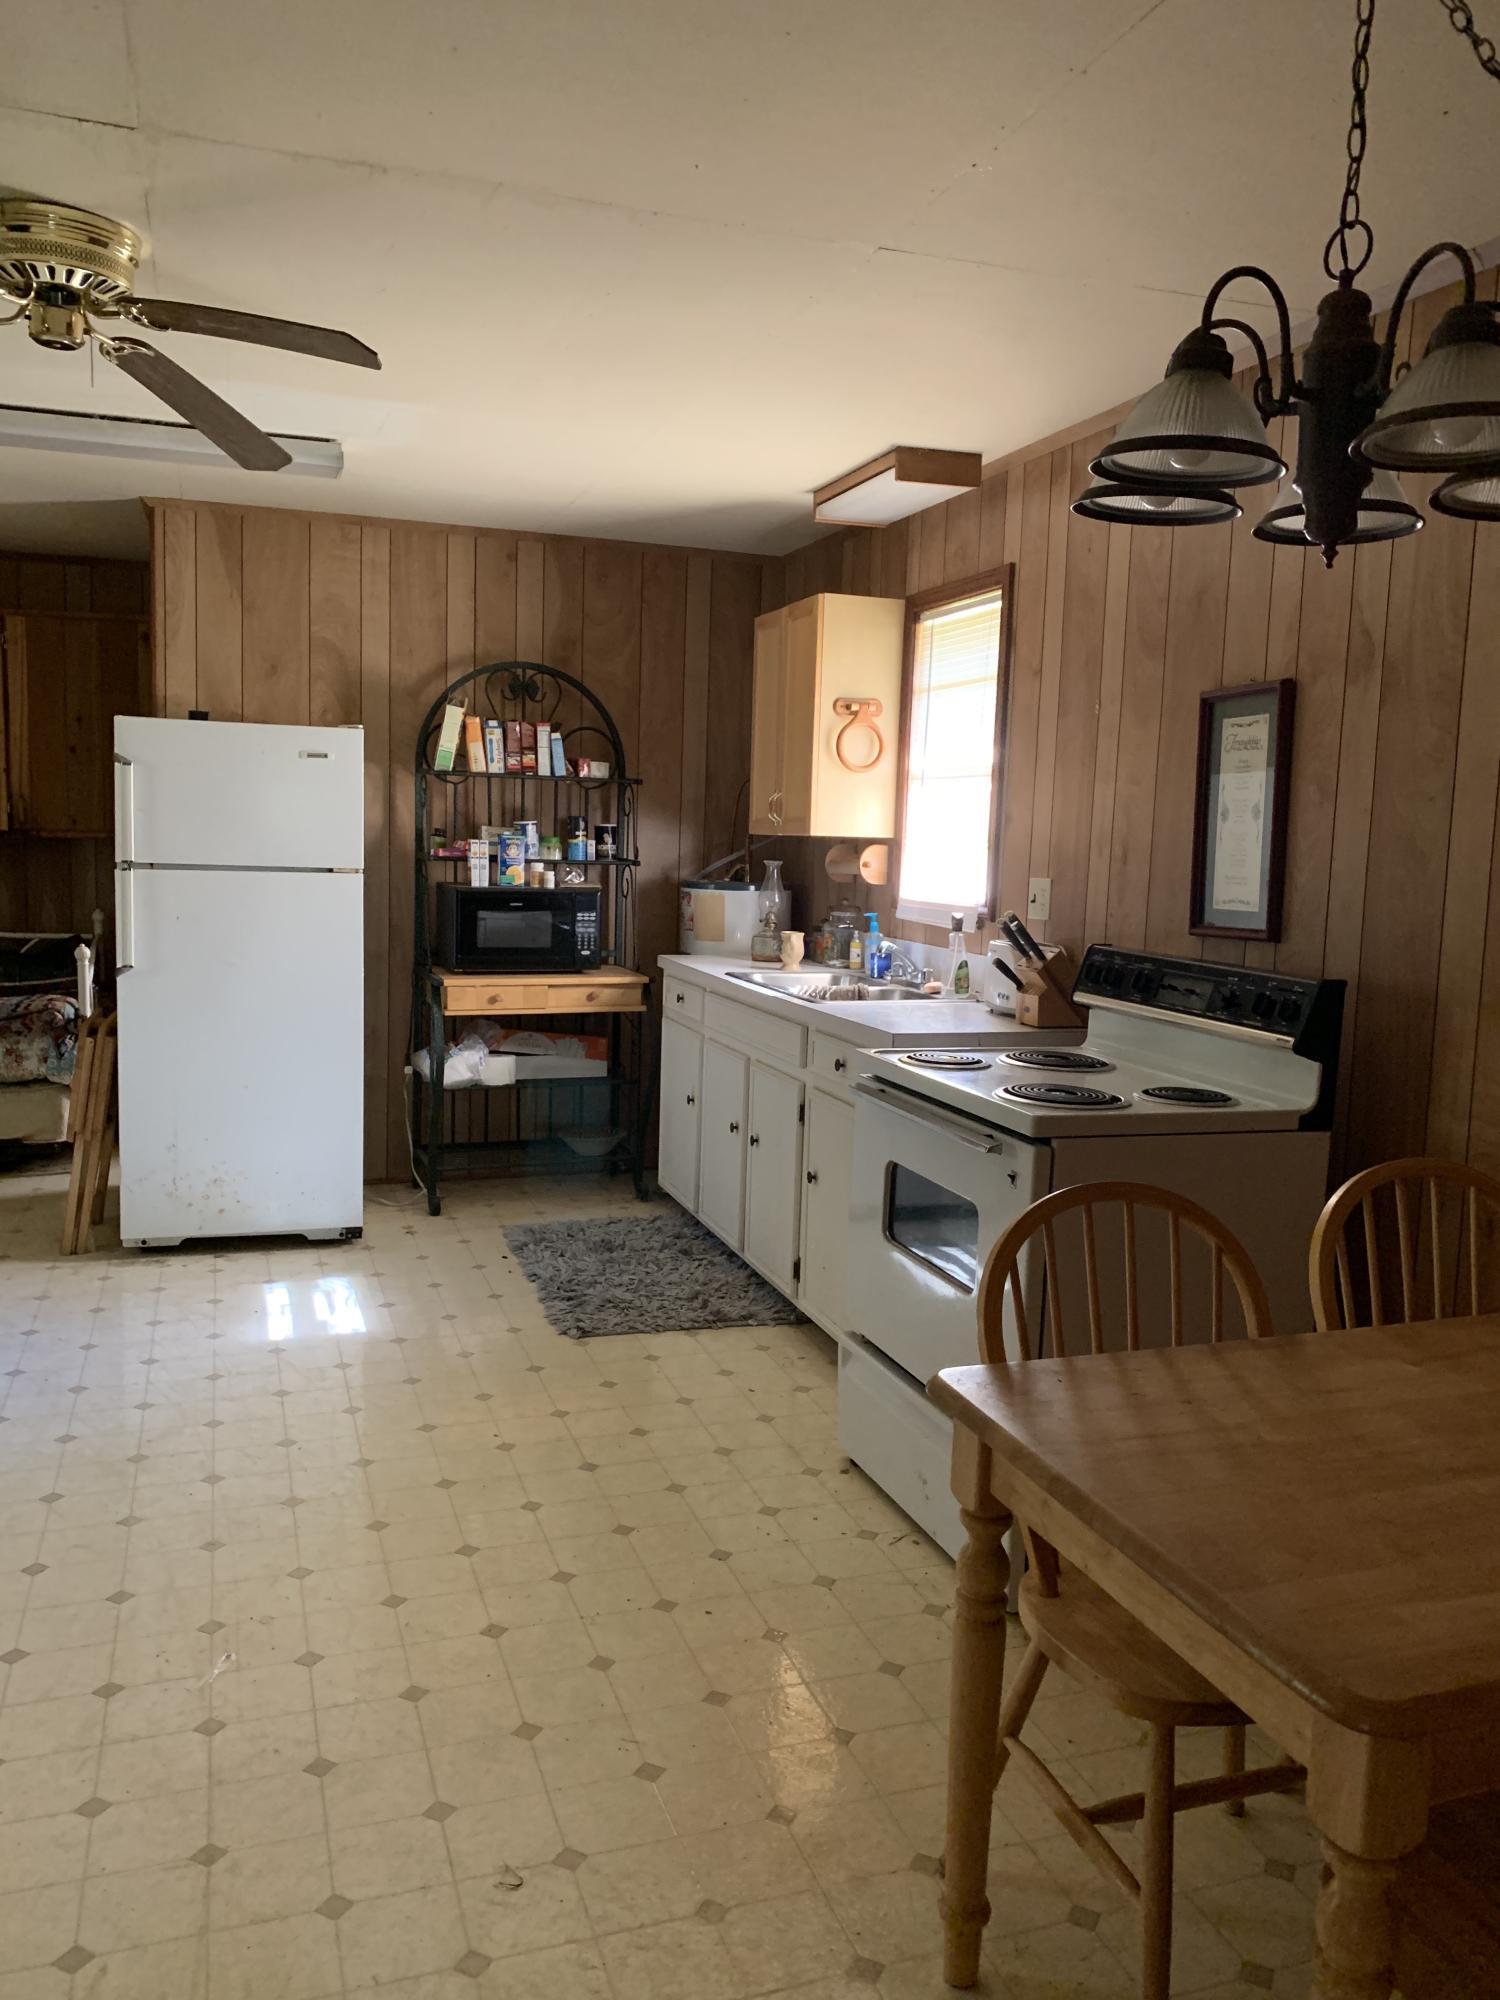 Mittie home for sale, 1033 Gravel Pit Rd, Mittie LA - $350,000